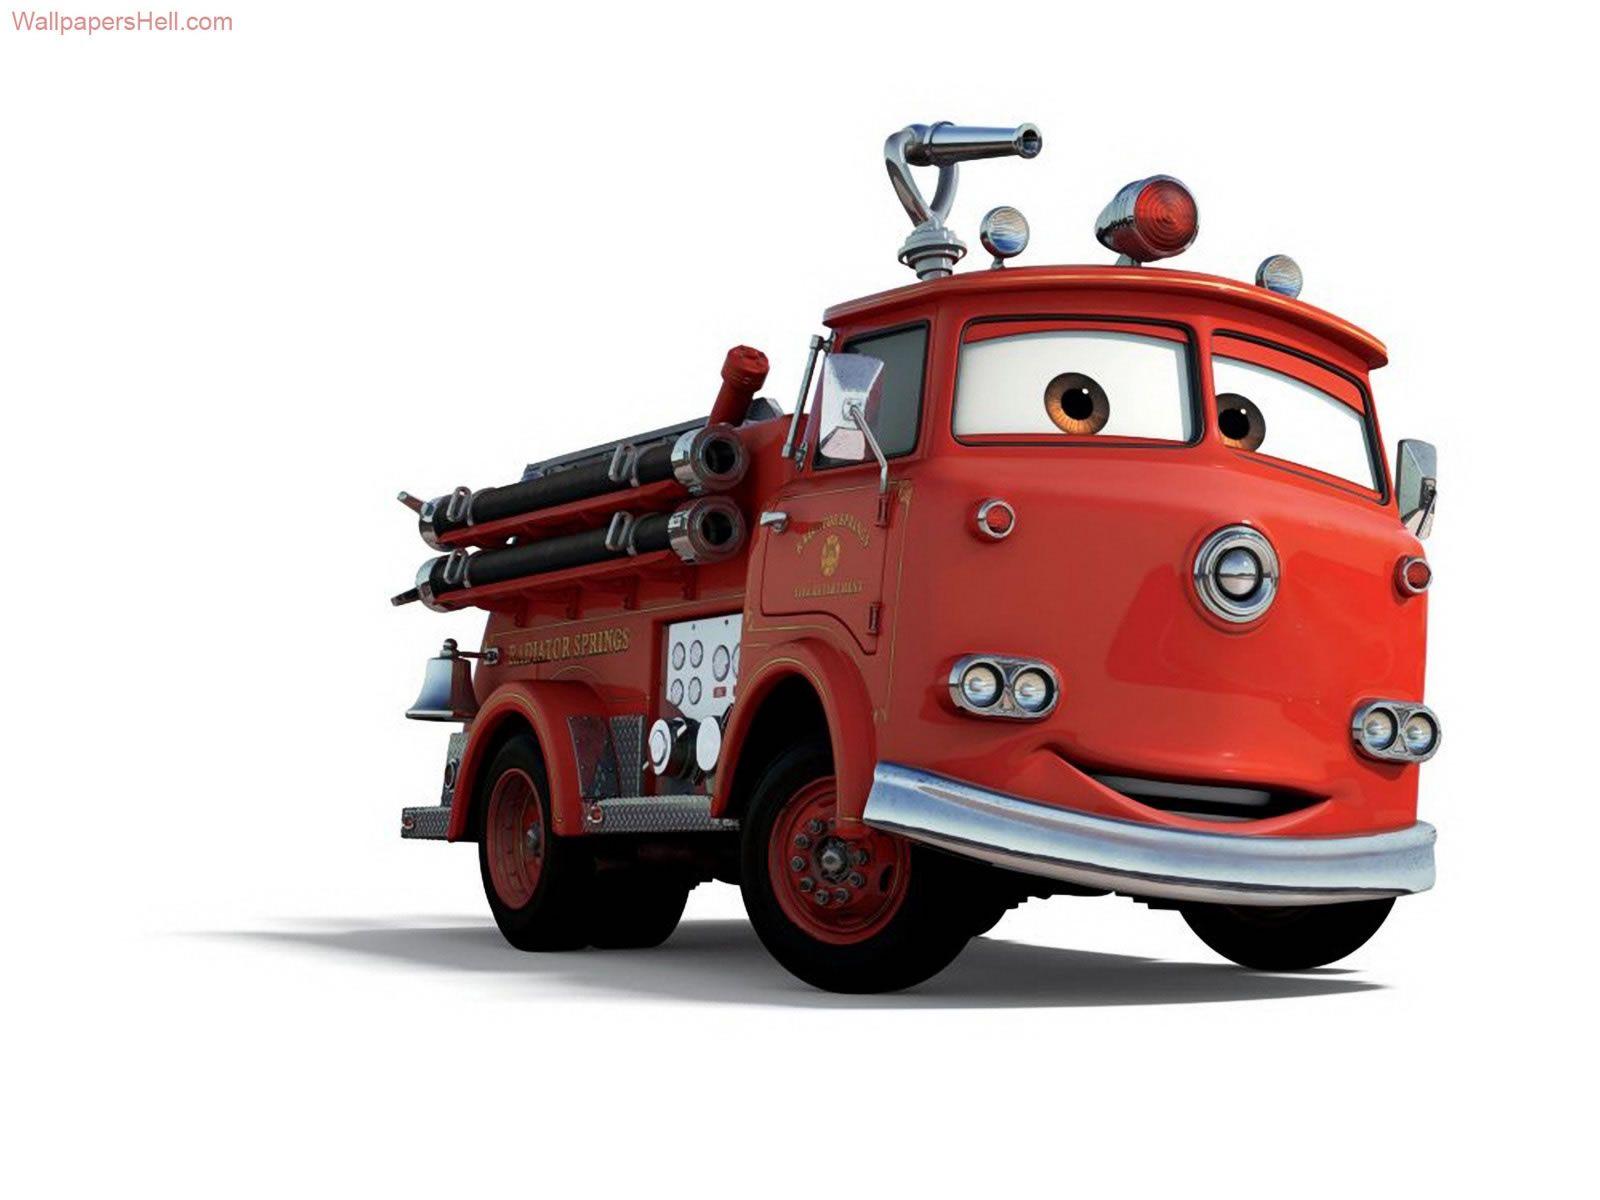 Disney Cars Images Free Disney Cars Wallpaper Free Disney Cars